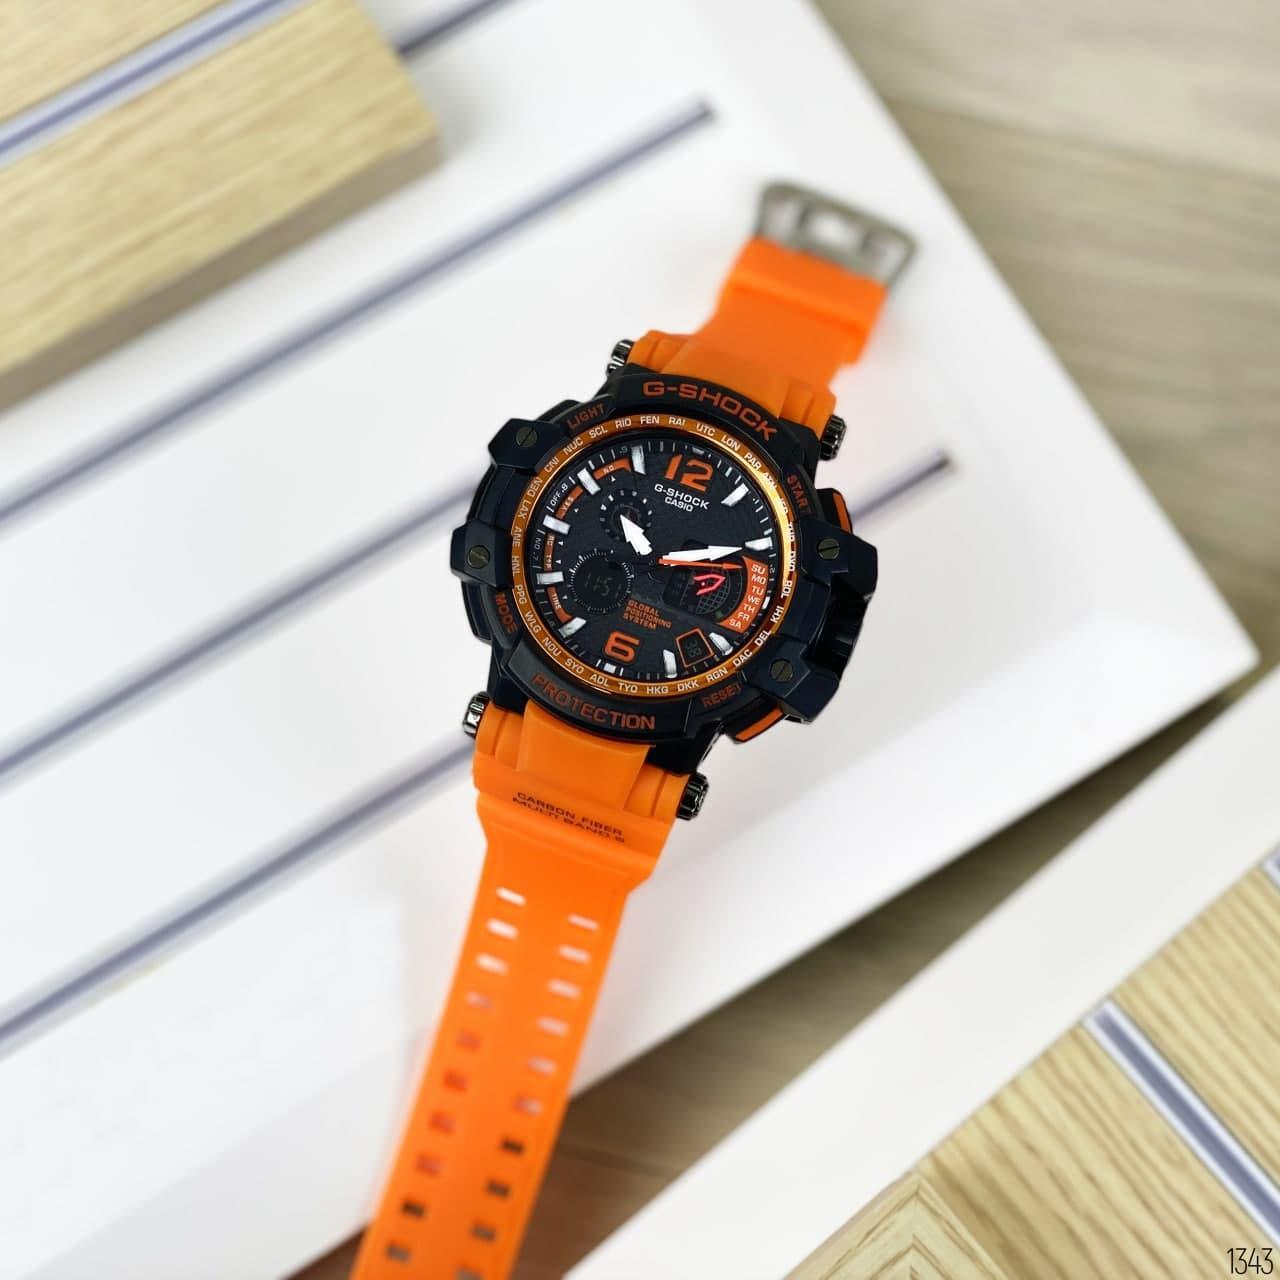 Casio G-Shock GPW-1000 (Black-Orange)